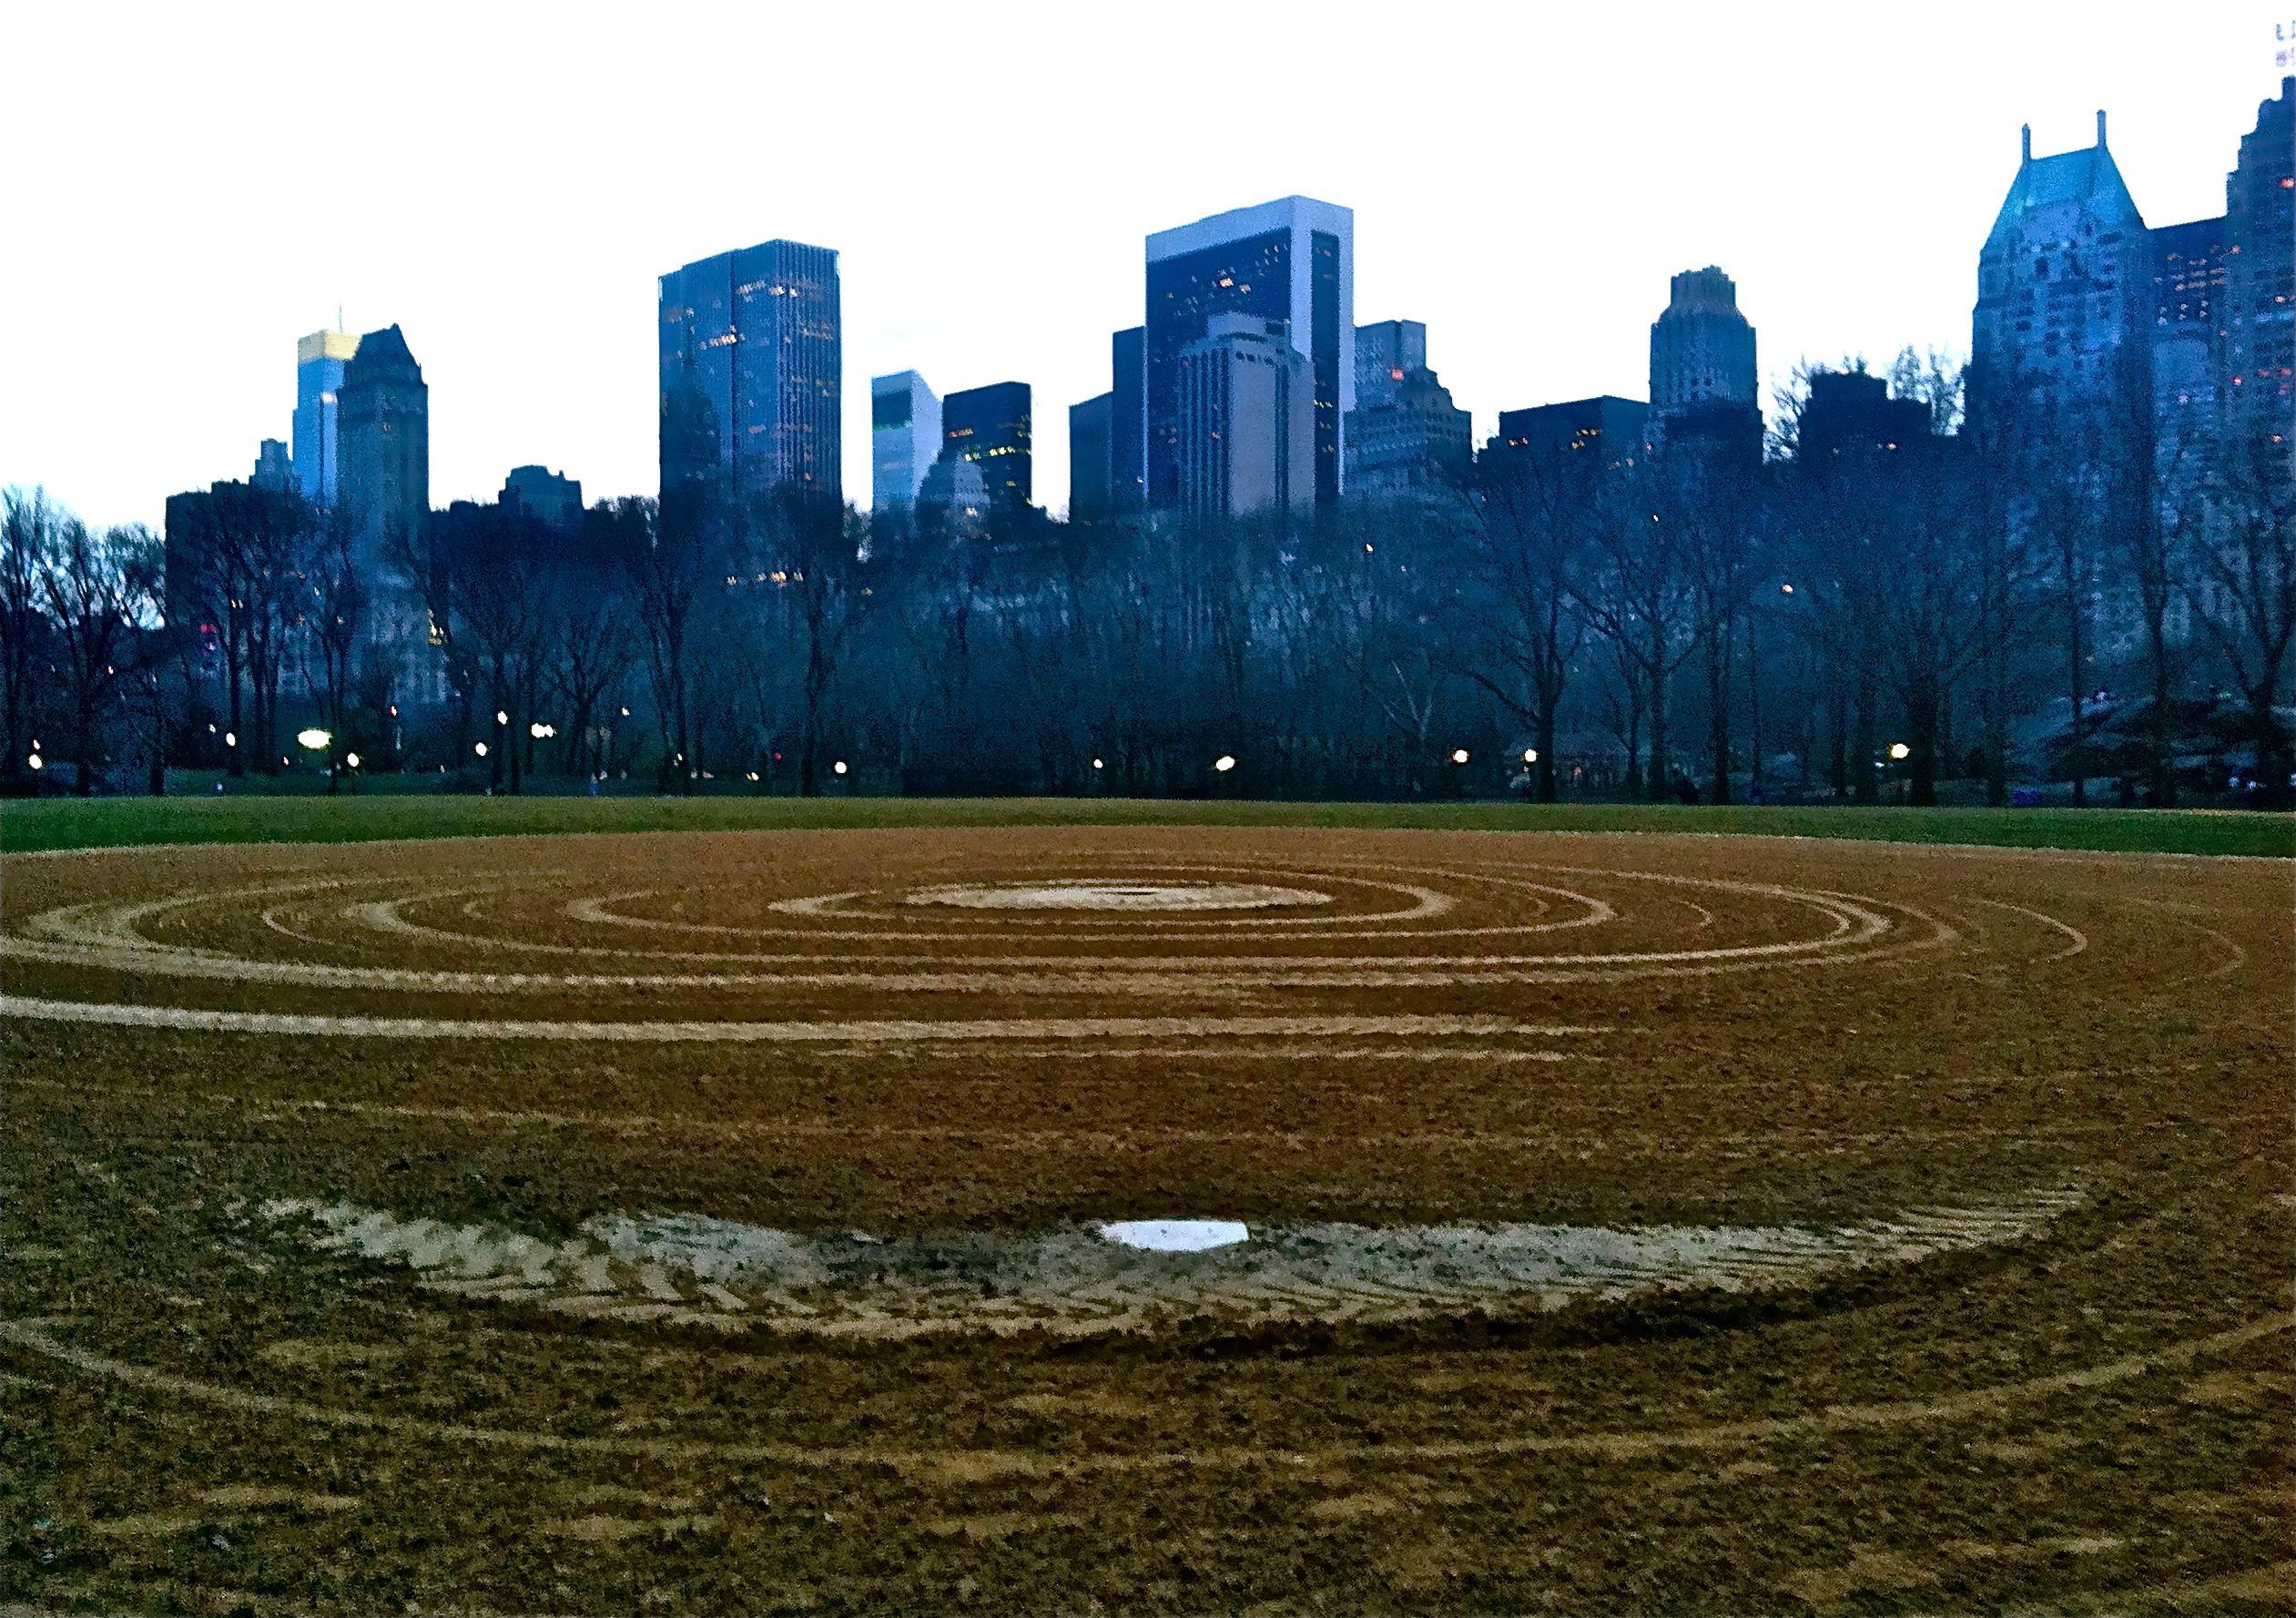 3/12/12 central park.